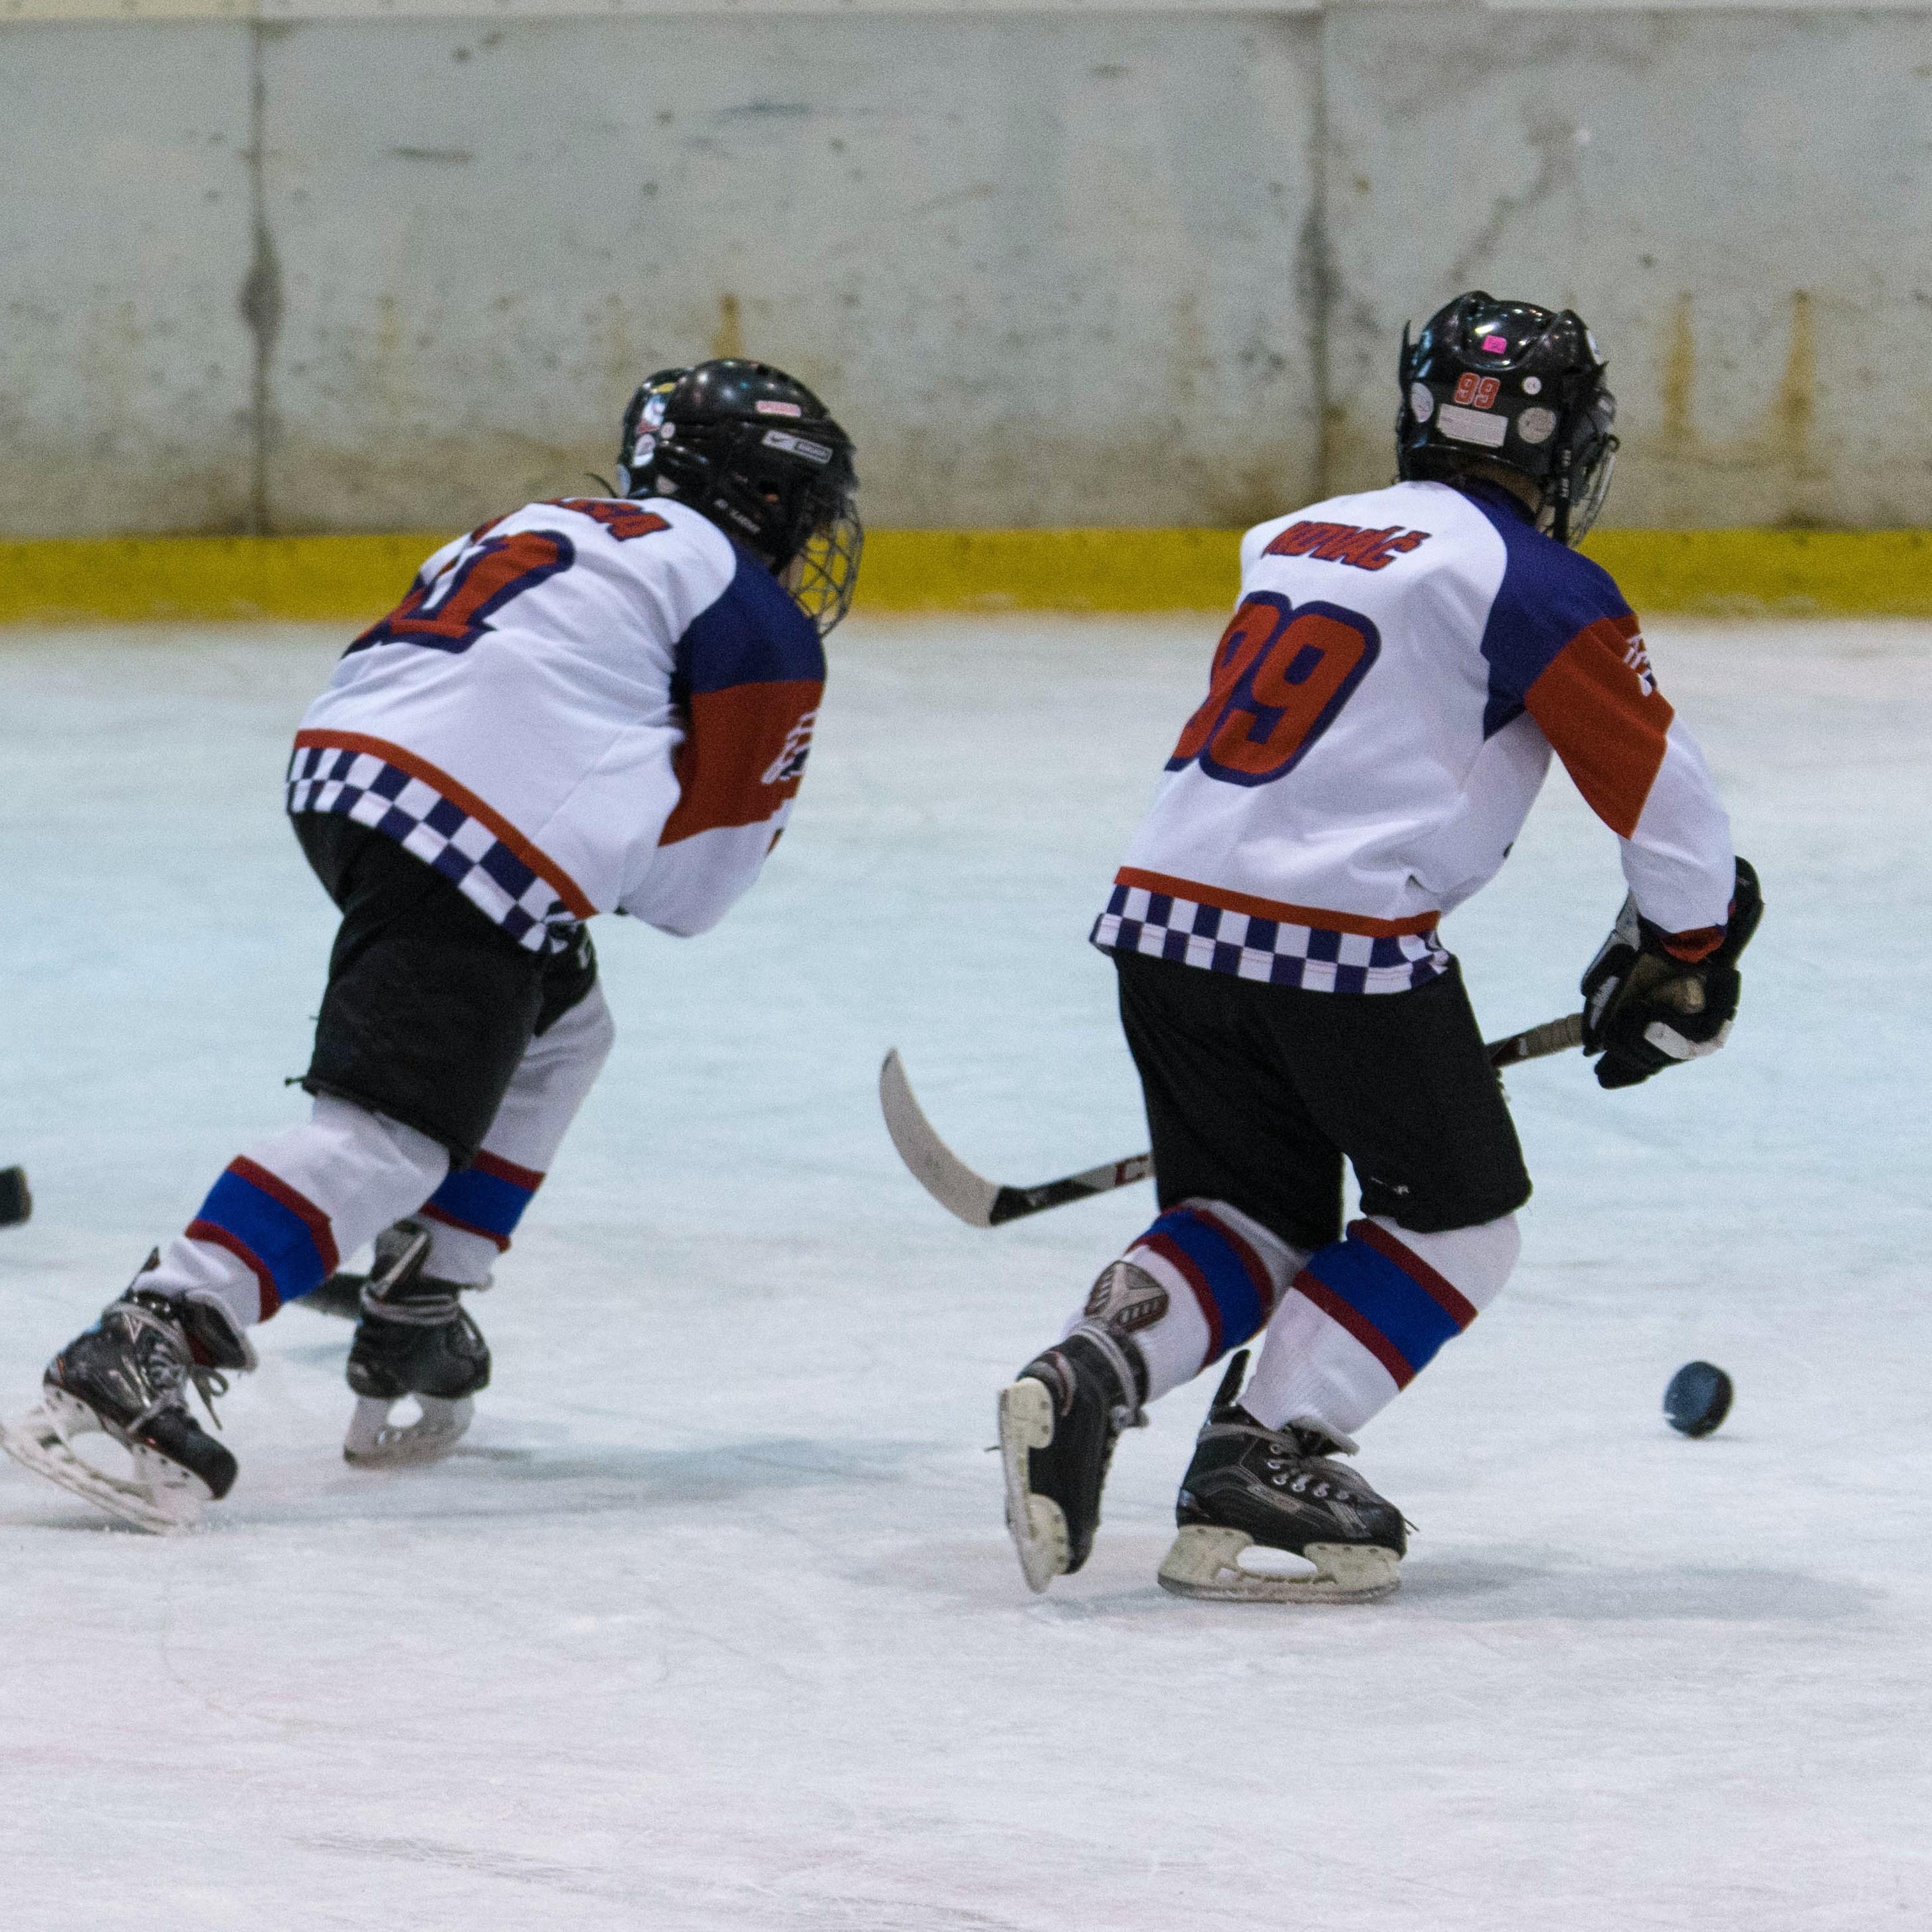 Speeders_sezona 2018_19 hokej turnaj lucenec 8